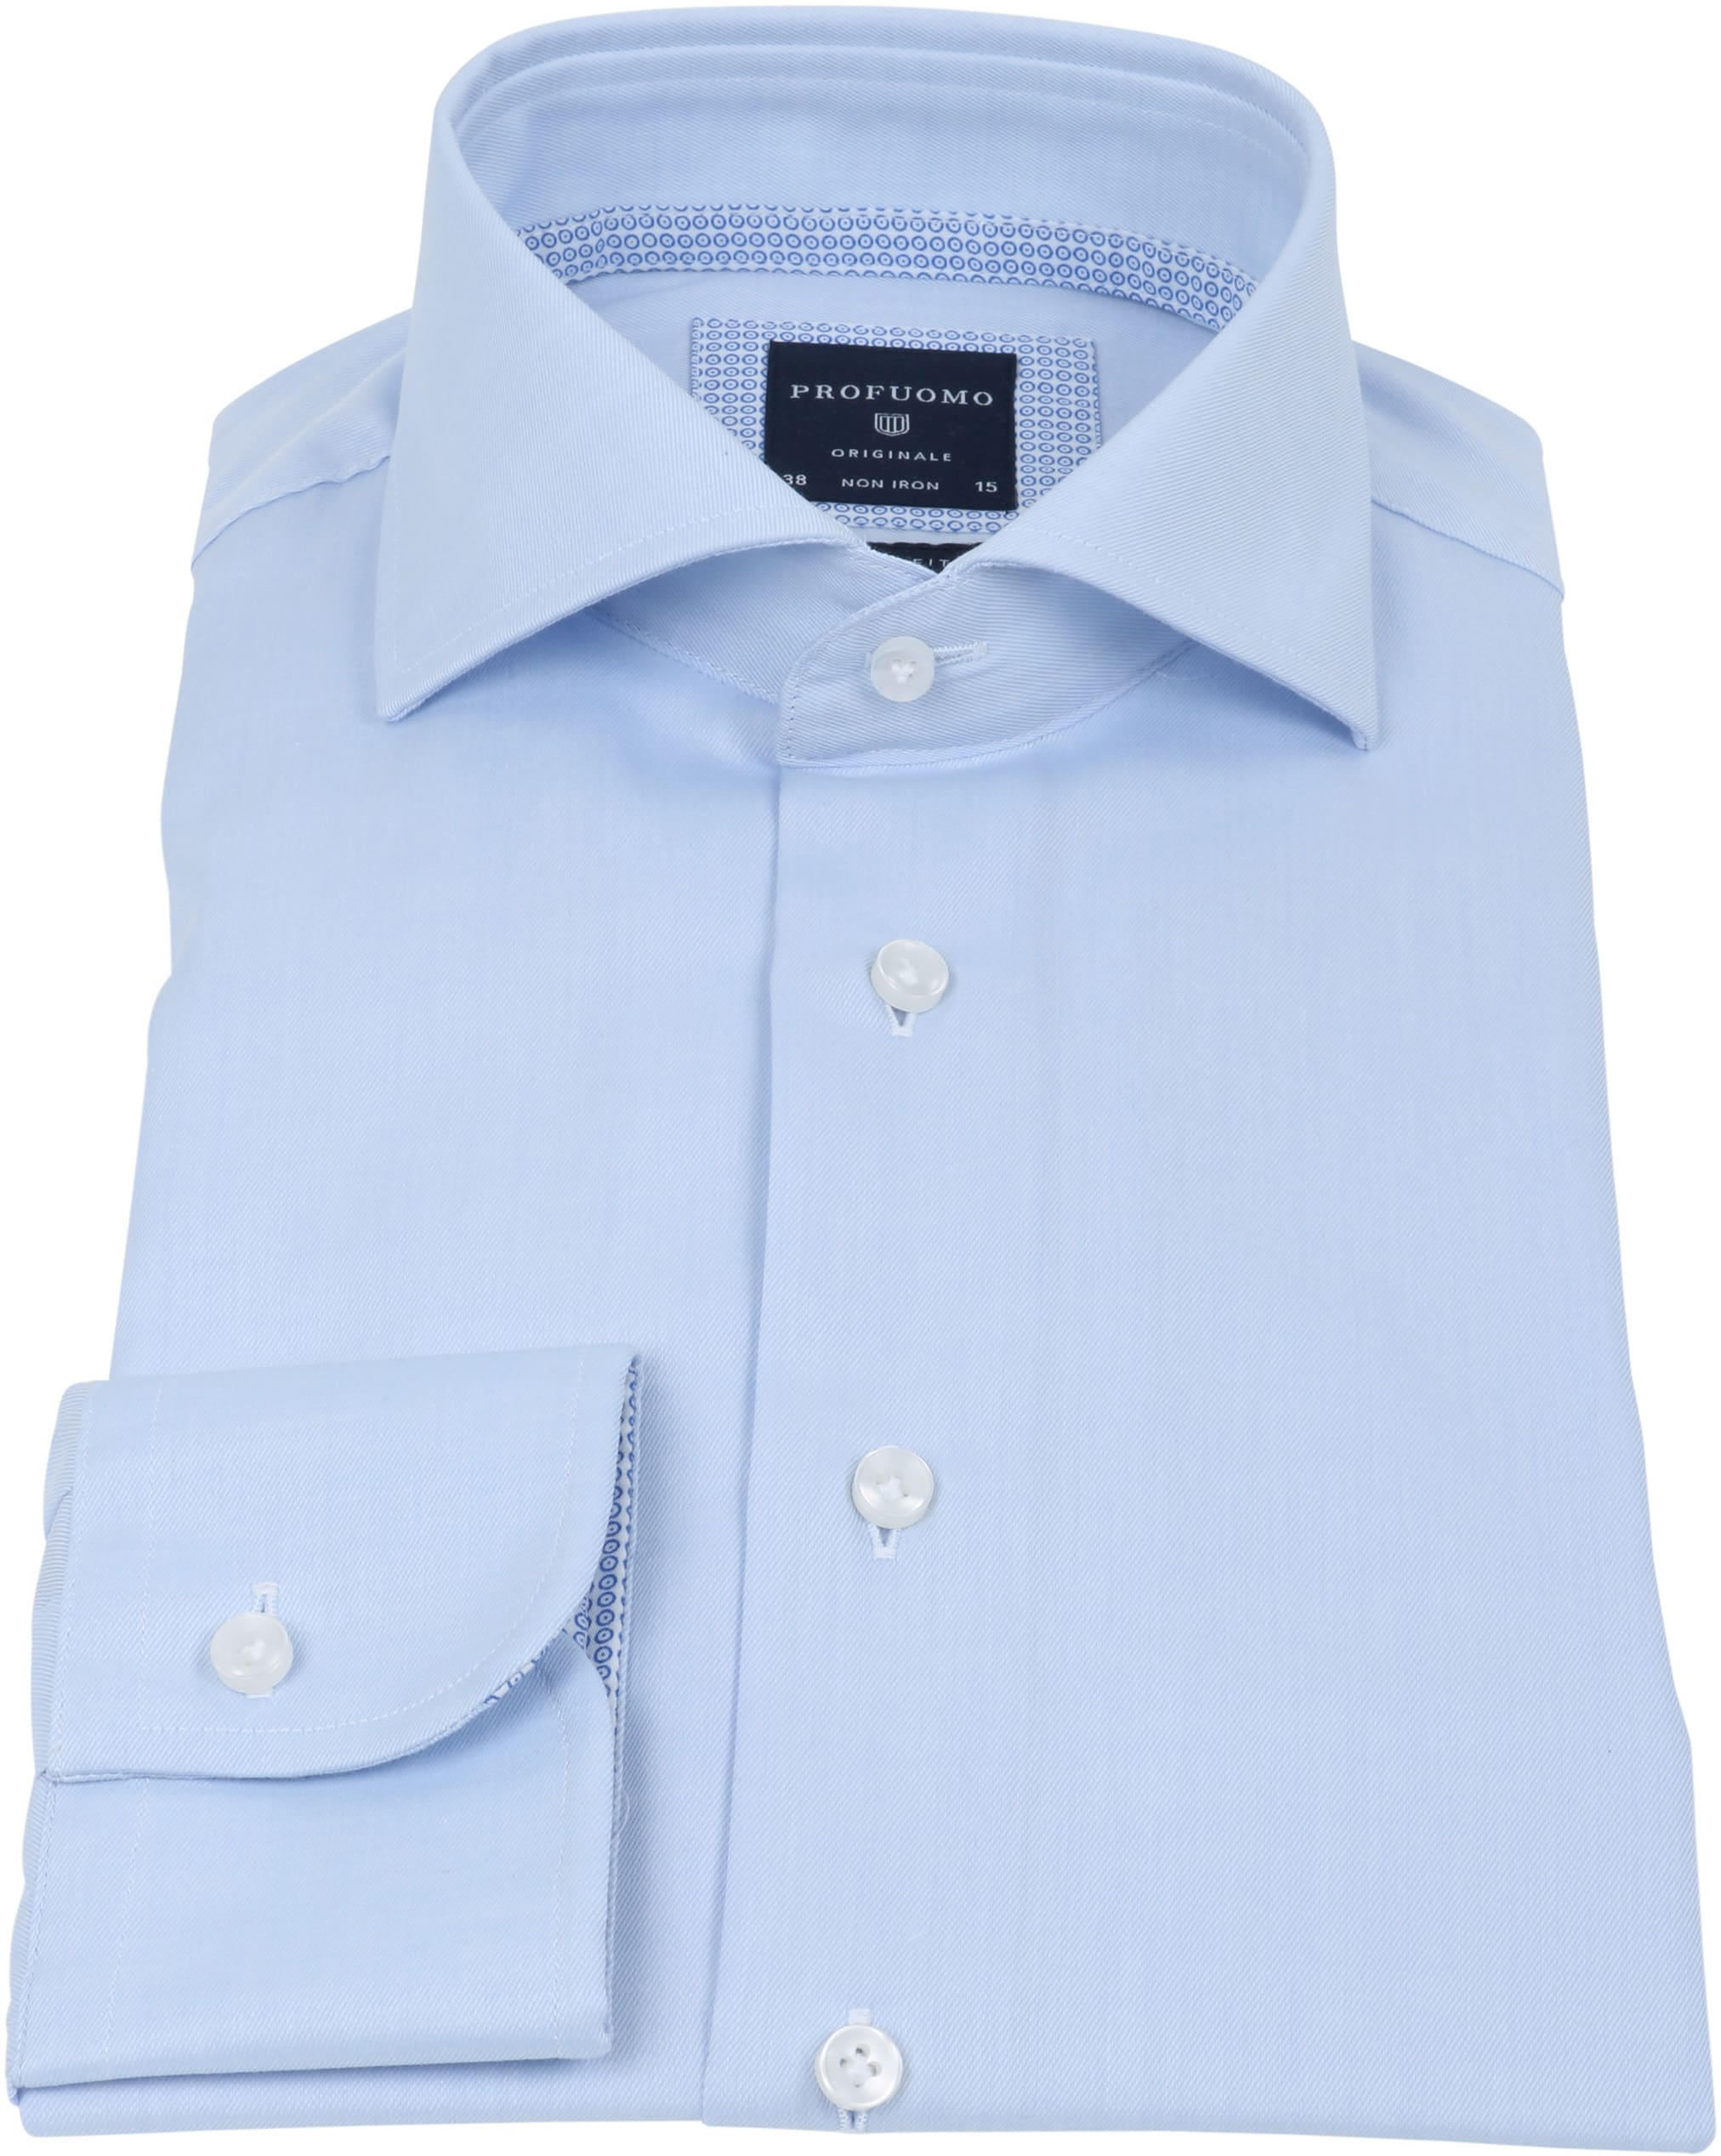 Profuomo Overhemd Lichtblauw foto 1